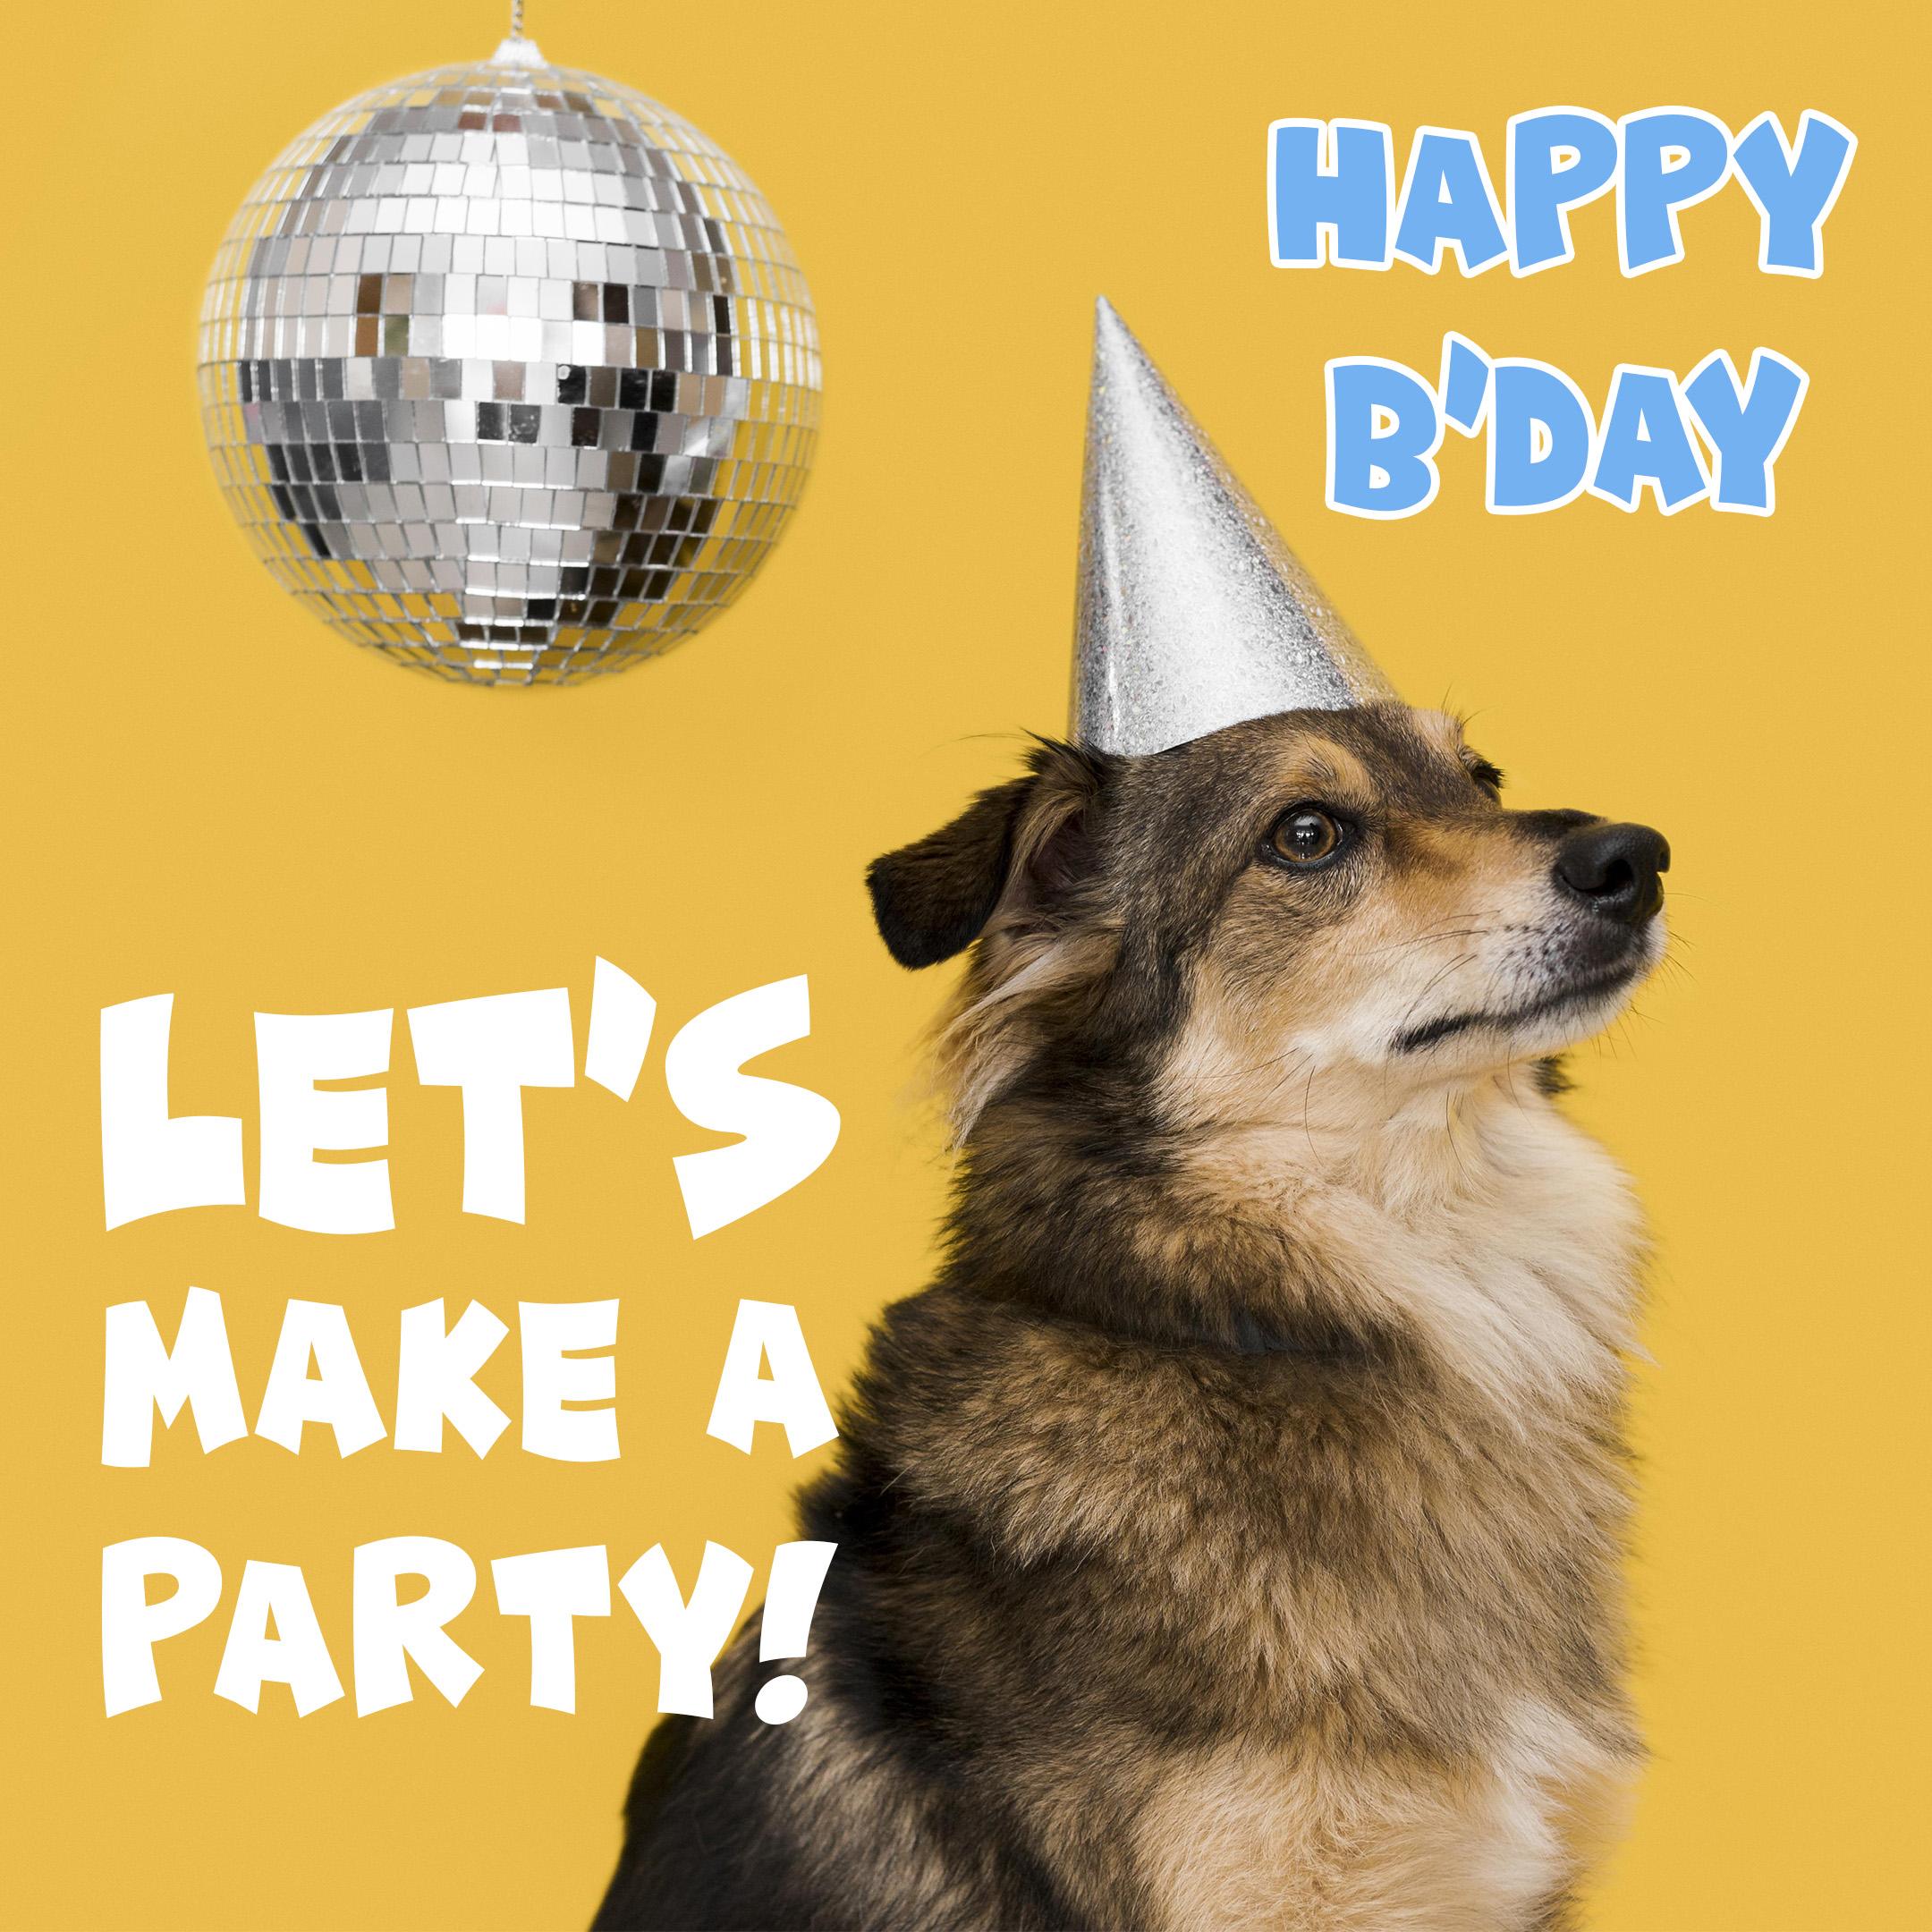 Free Funny Happy Birthday Image For Him (Man) With Dog - birthdayimg.com